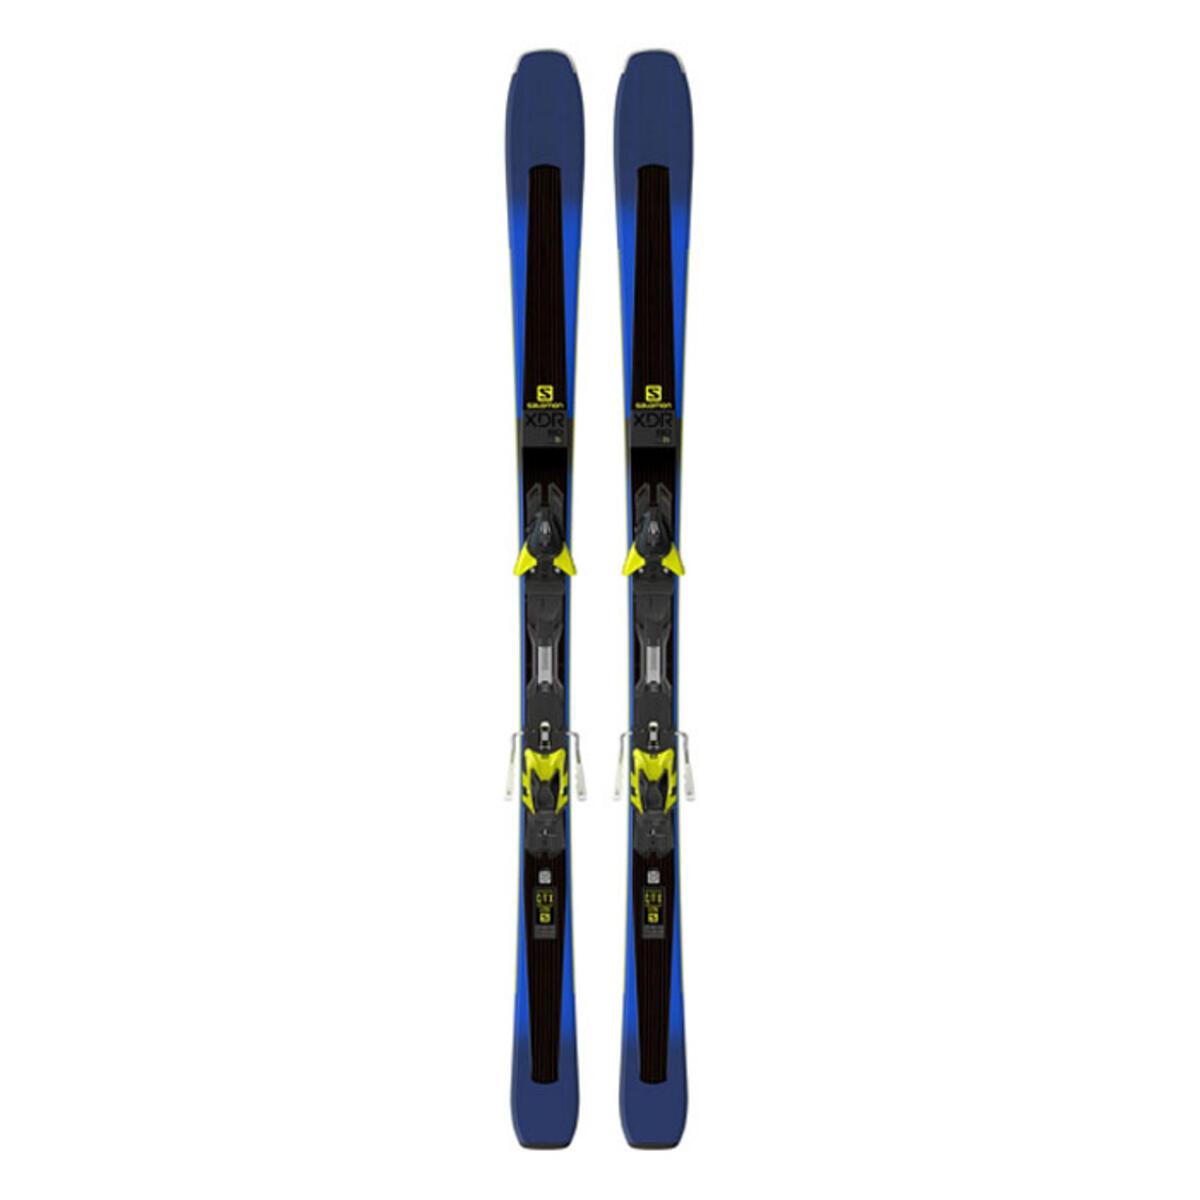 Salomon Men's XDR 80 Ti Skis With XT12 Bindings '18